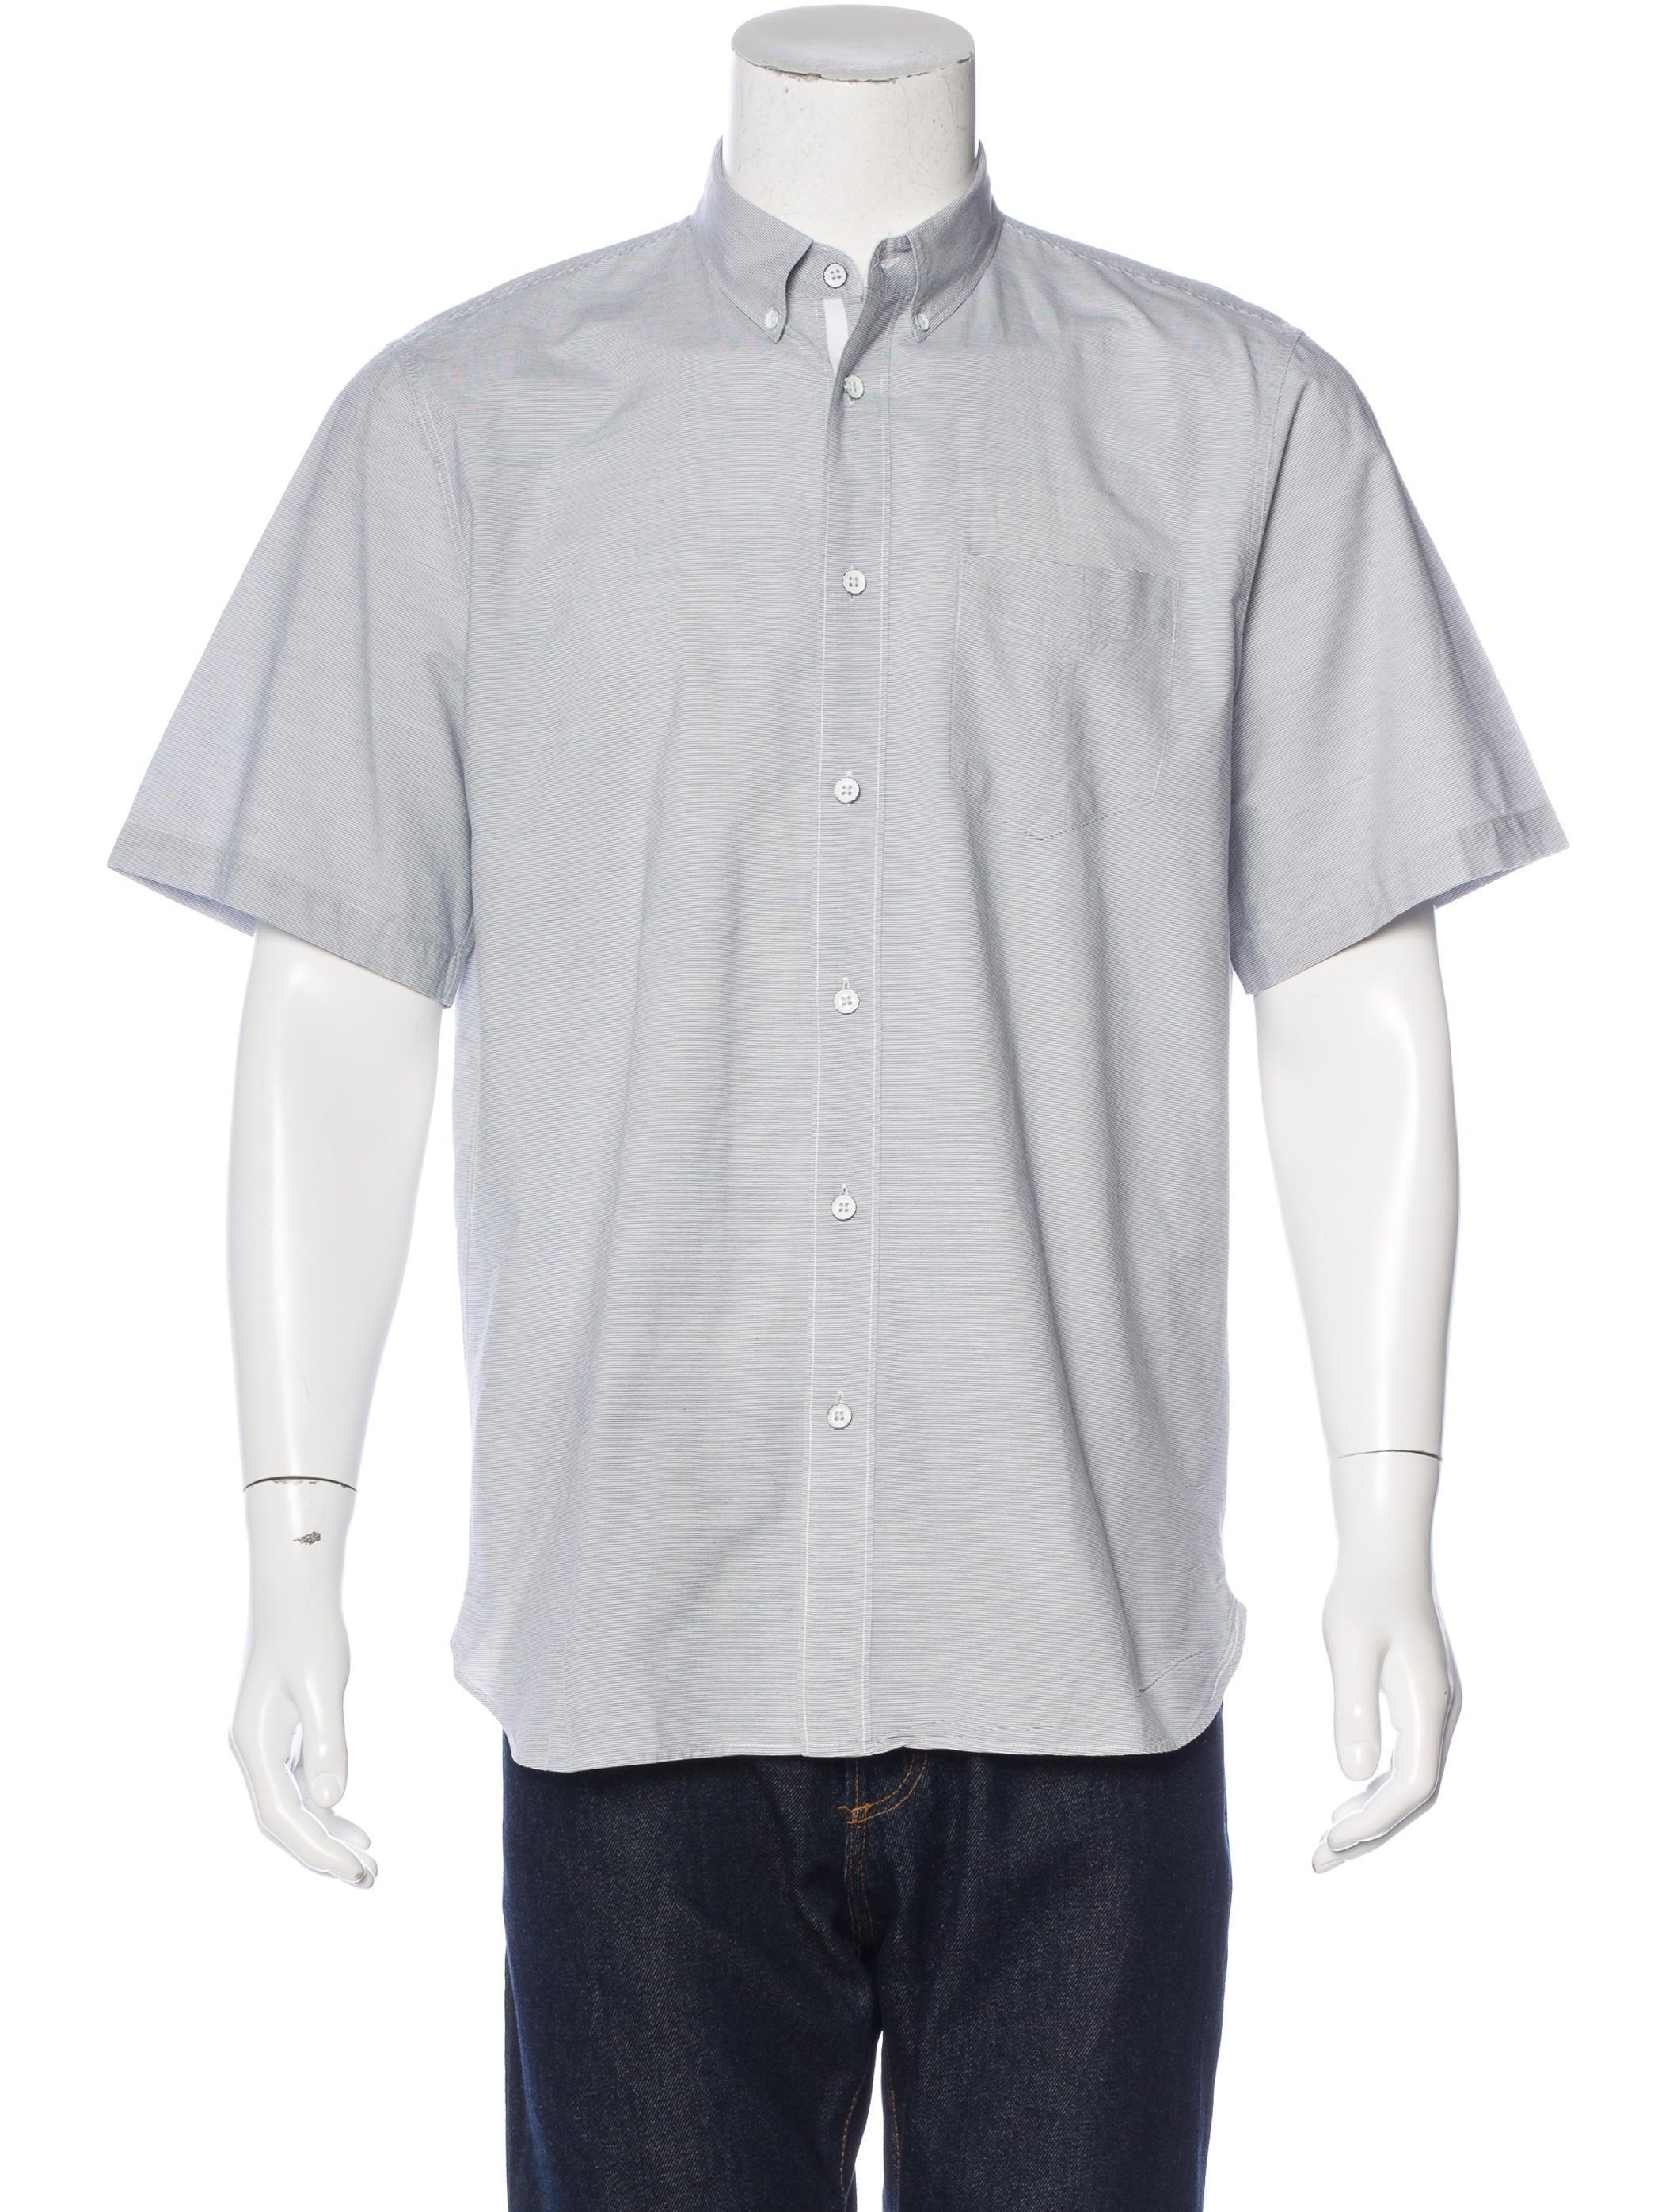 Rag bone striped button down shirt clothing for Striped button down shirts for men